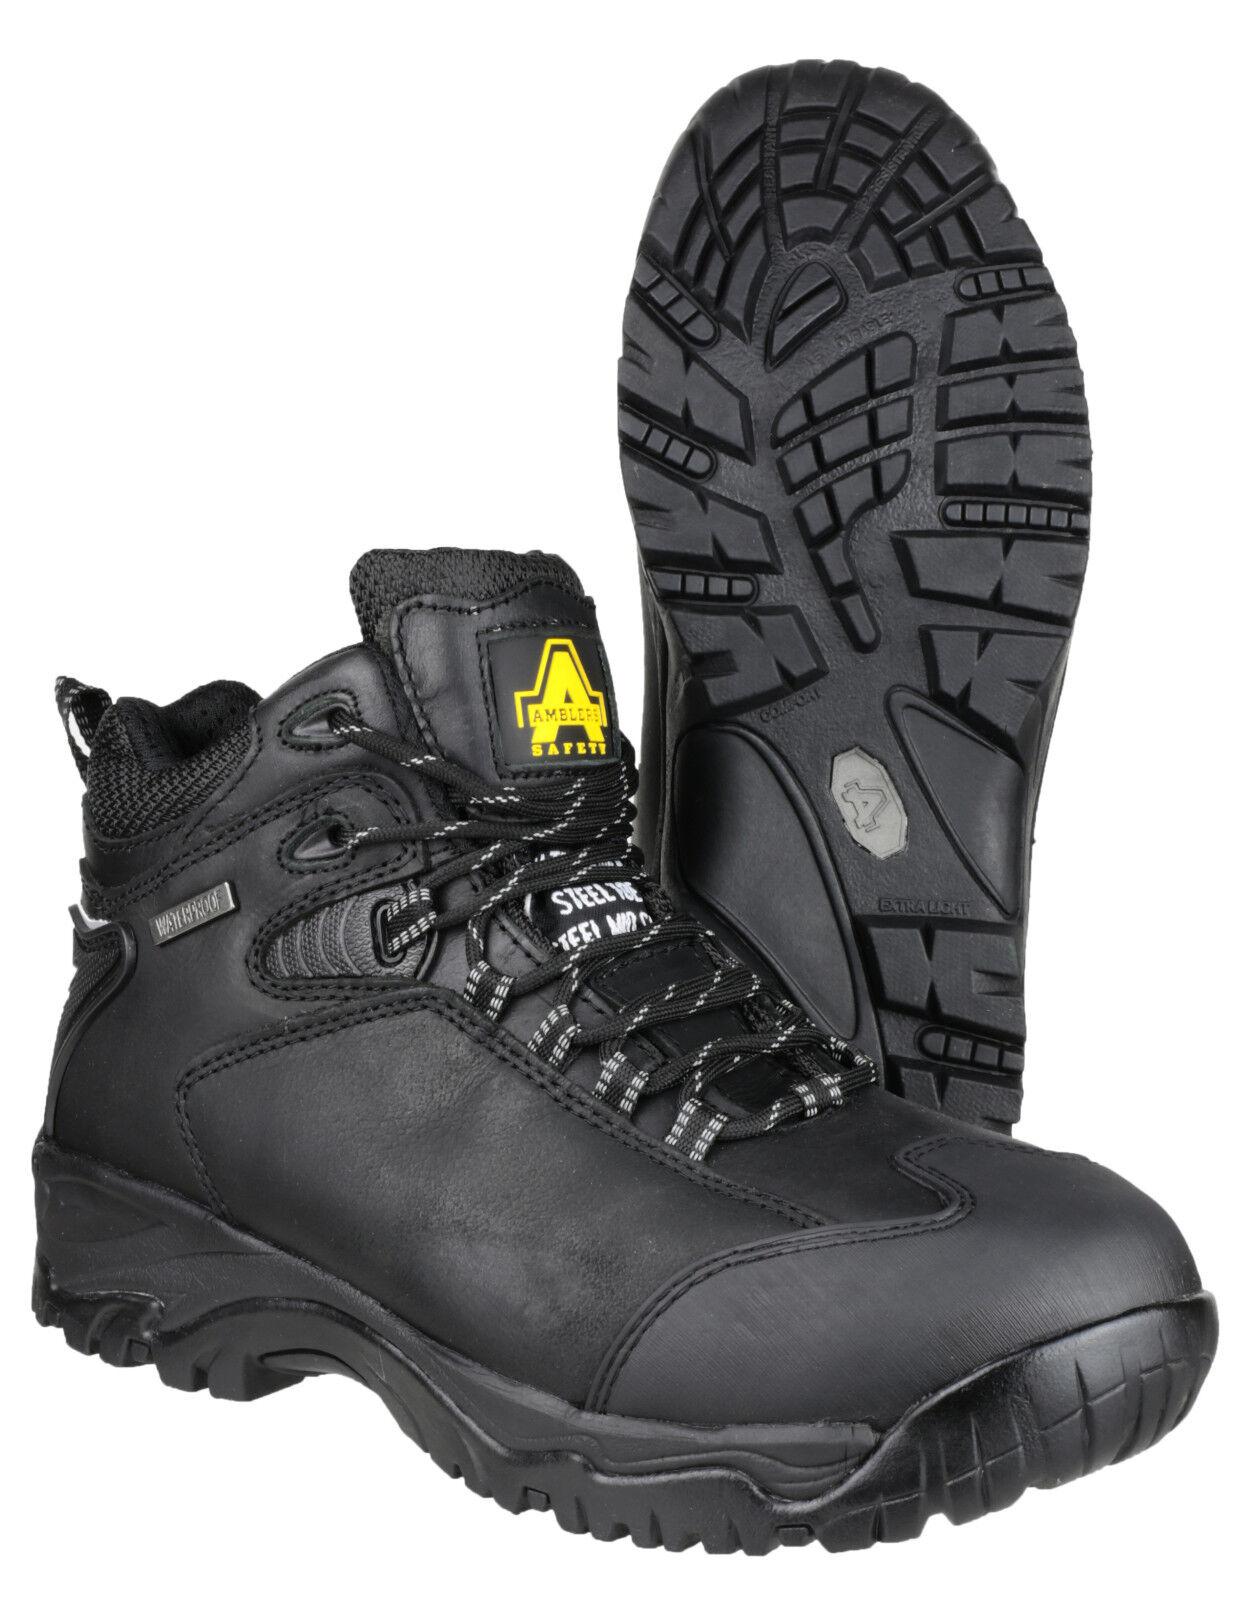 Amblers FS190 Impermeable Puntera De Acero Para Hombre Seguridad botas Senderismo Caminar UK6-15